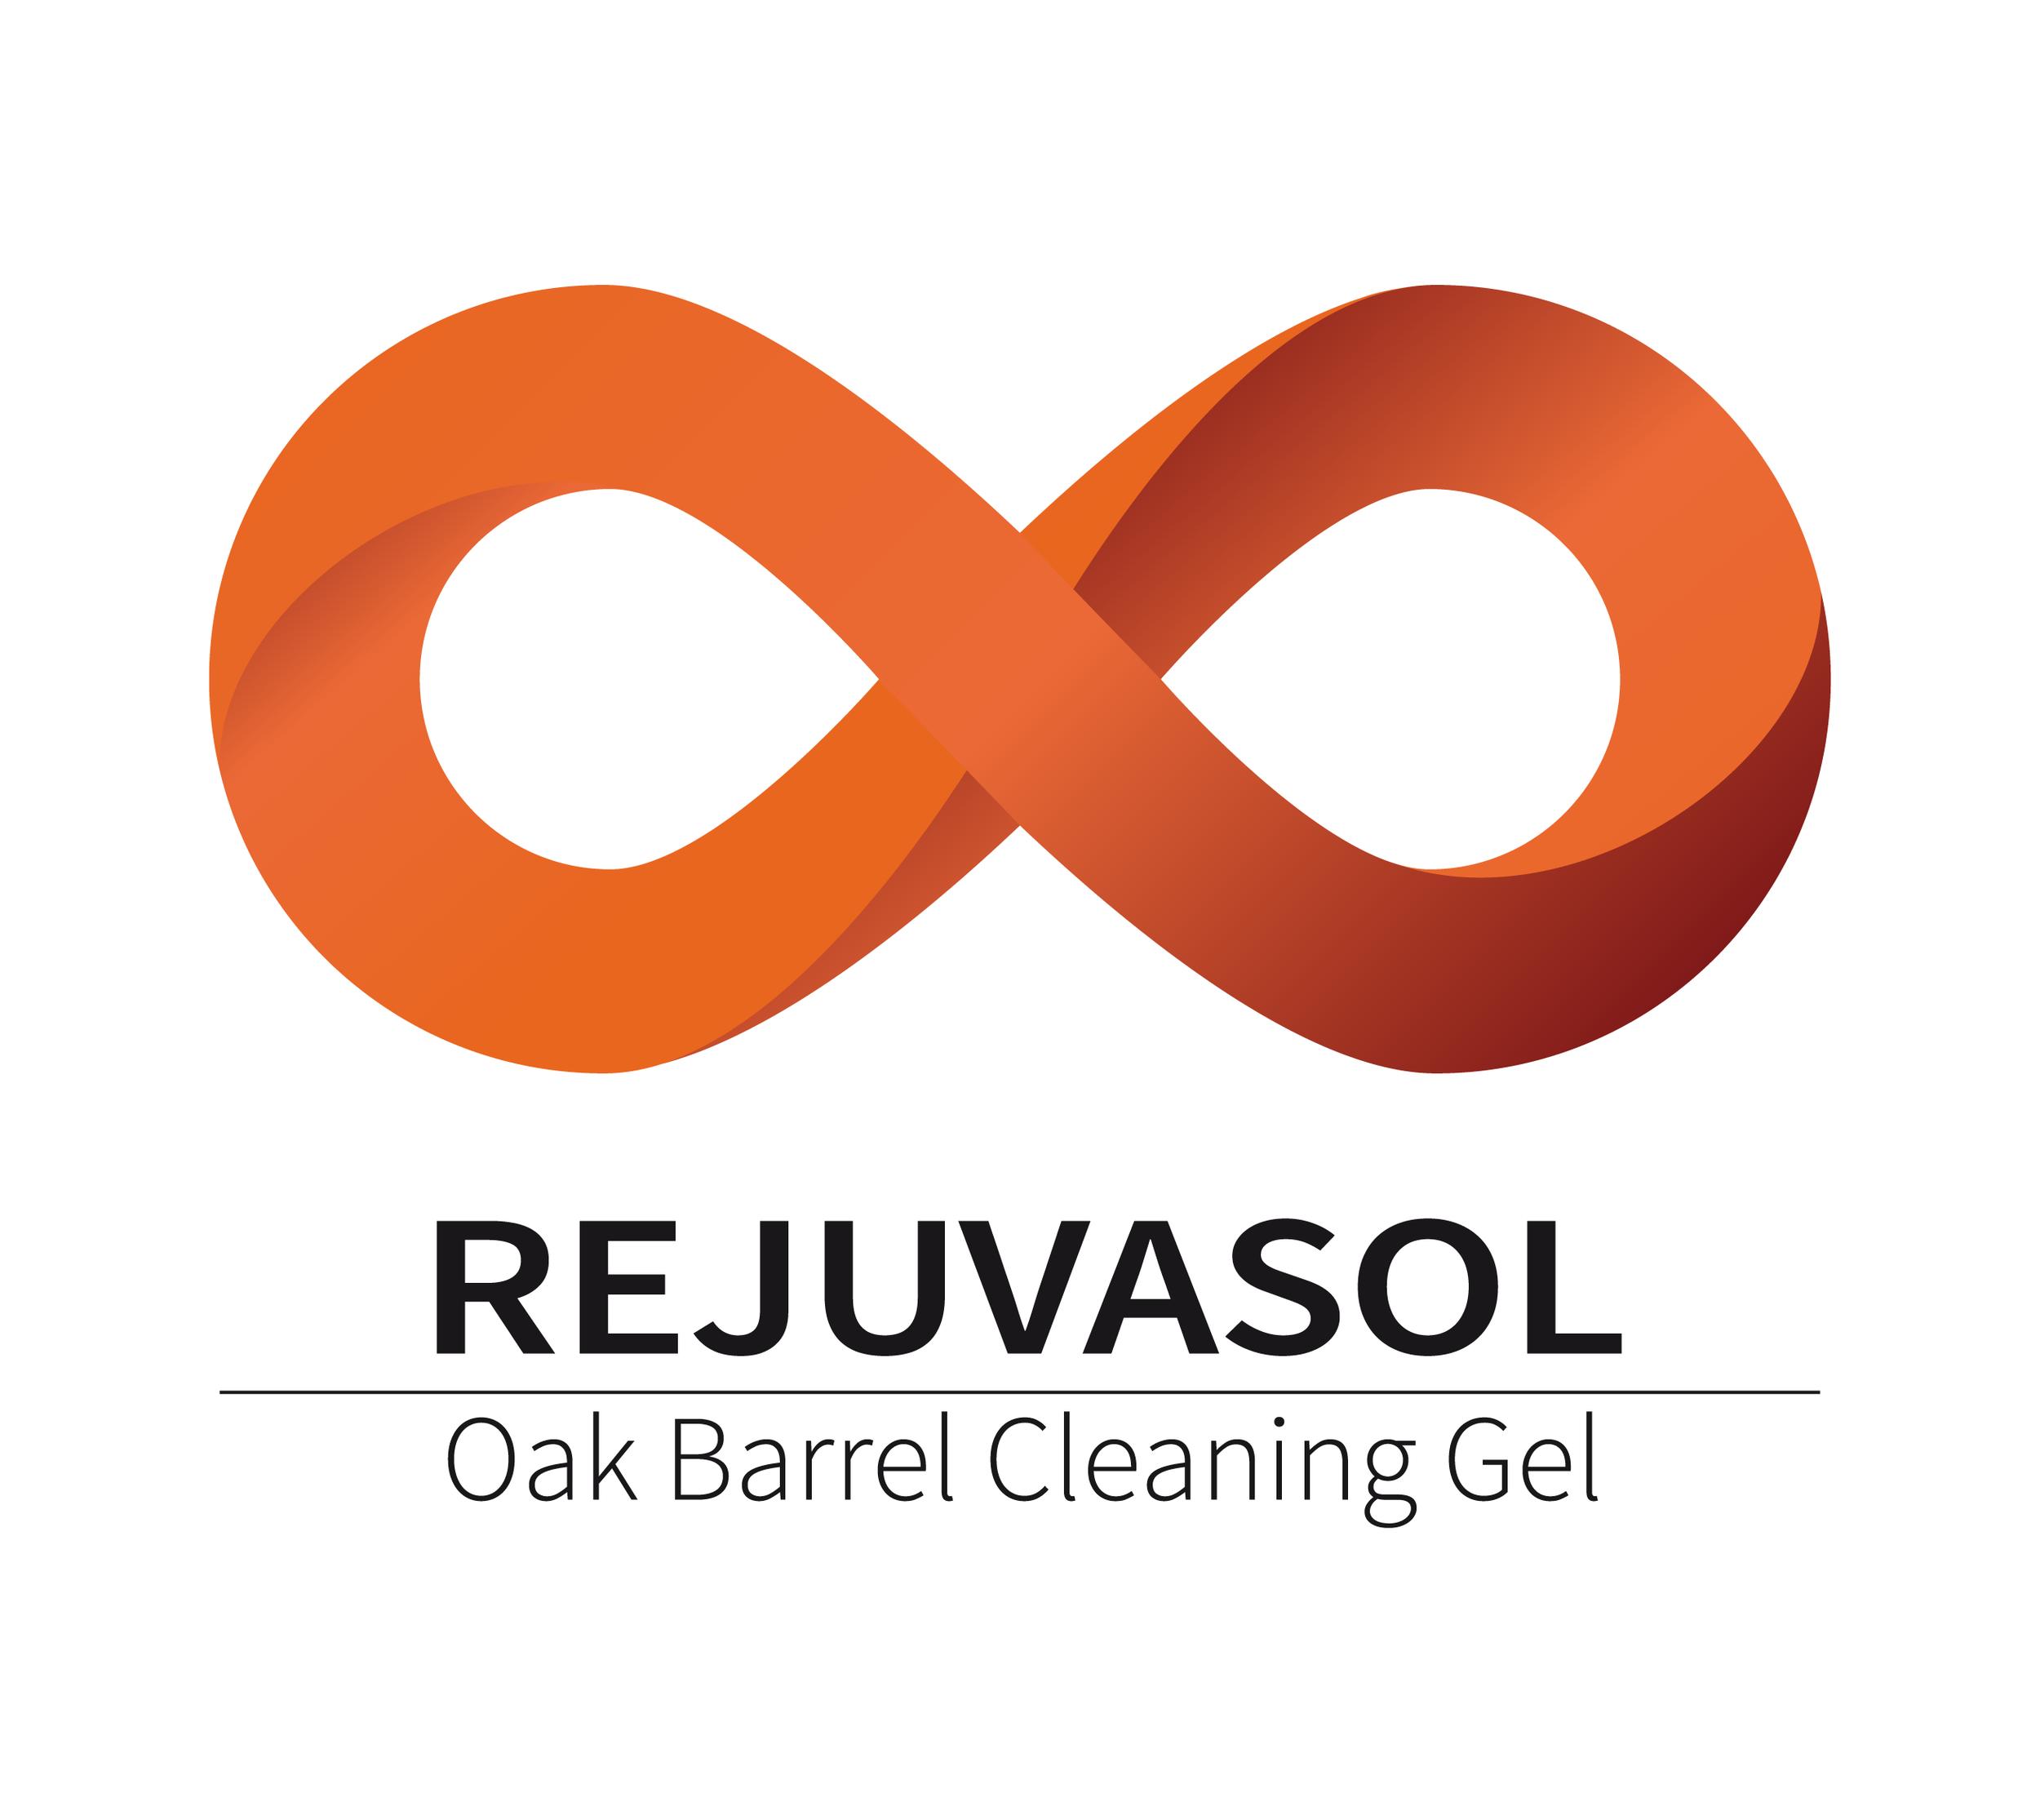 2013 AIRD Label Web (Rejuvasol)-01.png